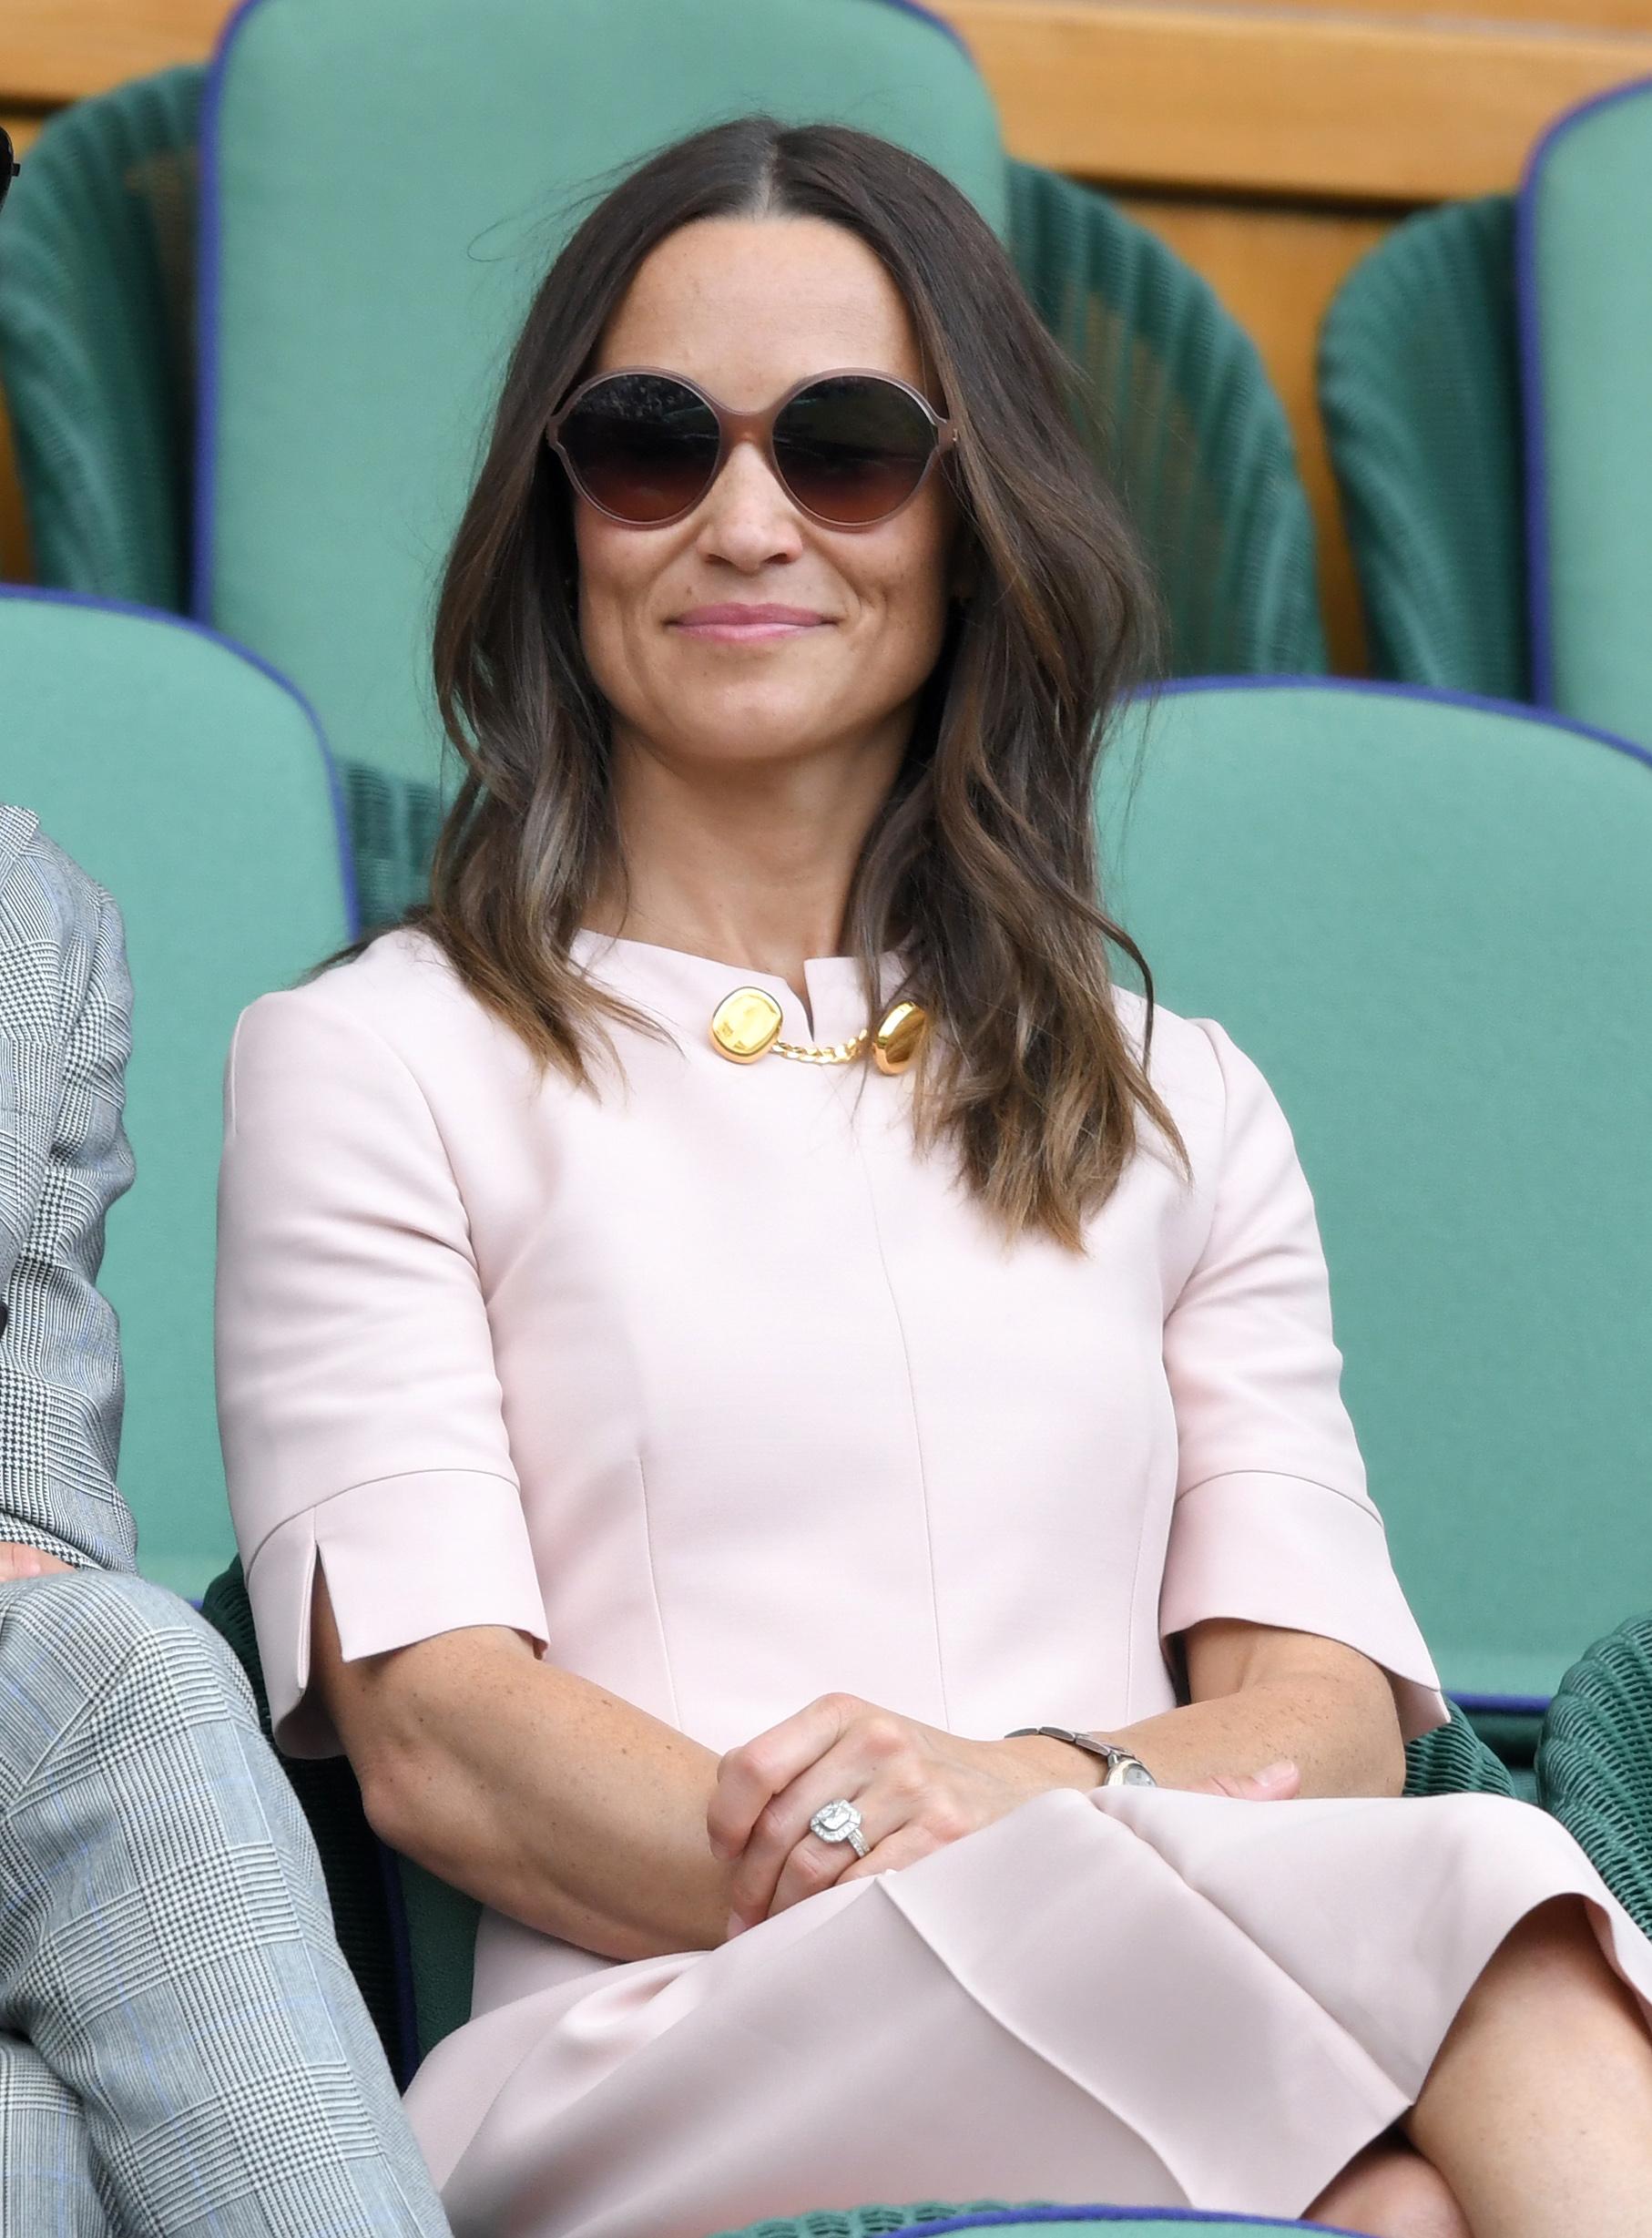 Pippa in Stella McCartney per Wimbledon